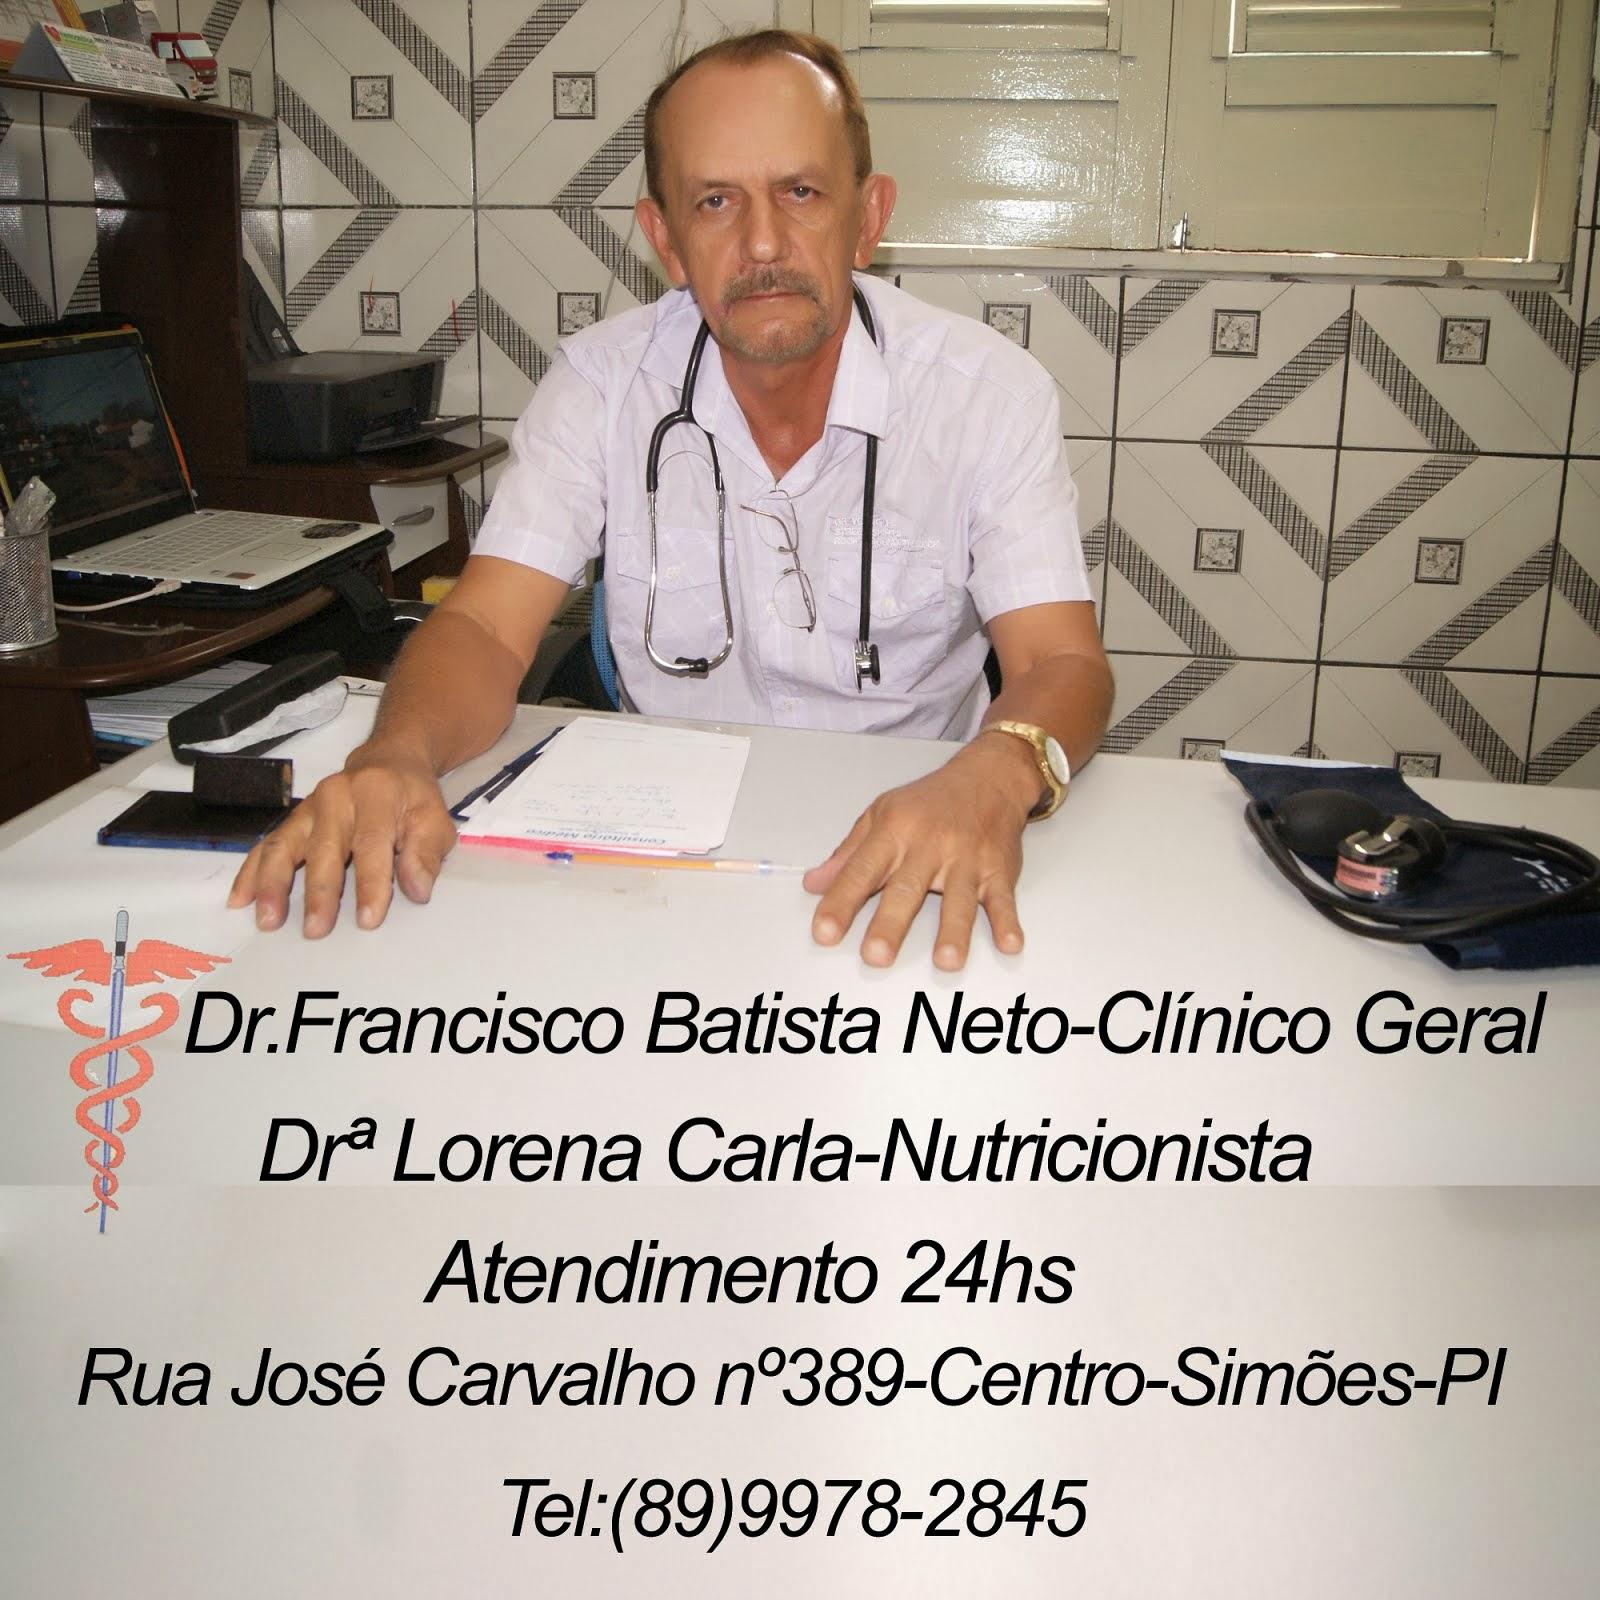 Dr.FRANCISCO BATISTA NETO